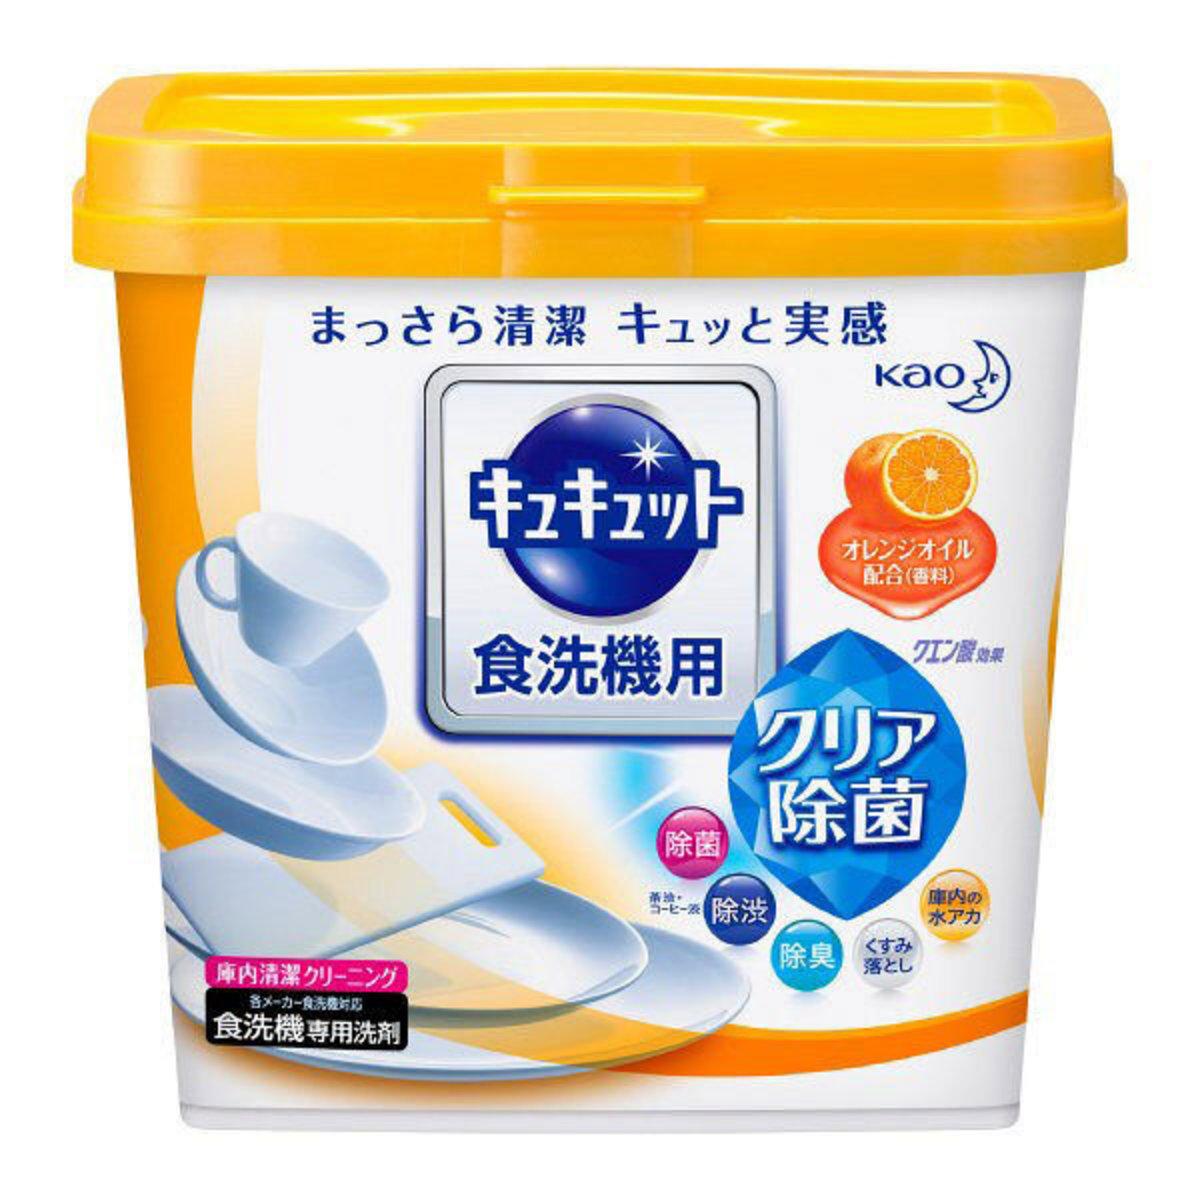 Dish Washing Machine Detergent- Tangerine(Orange)